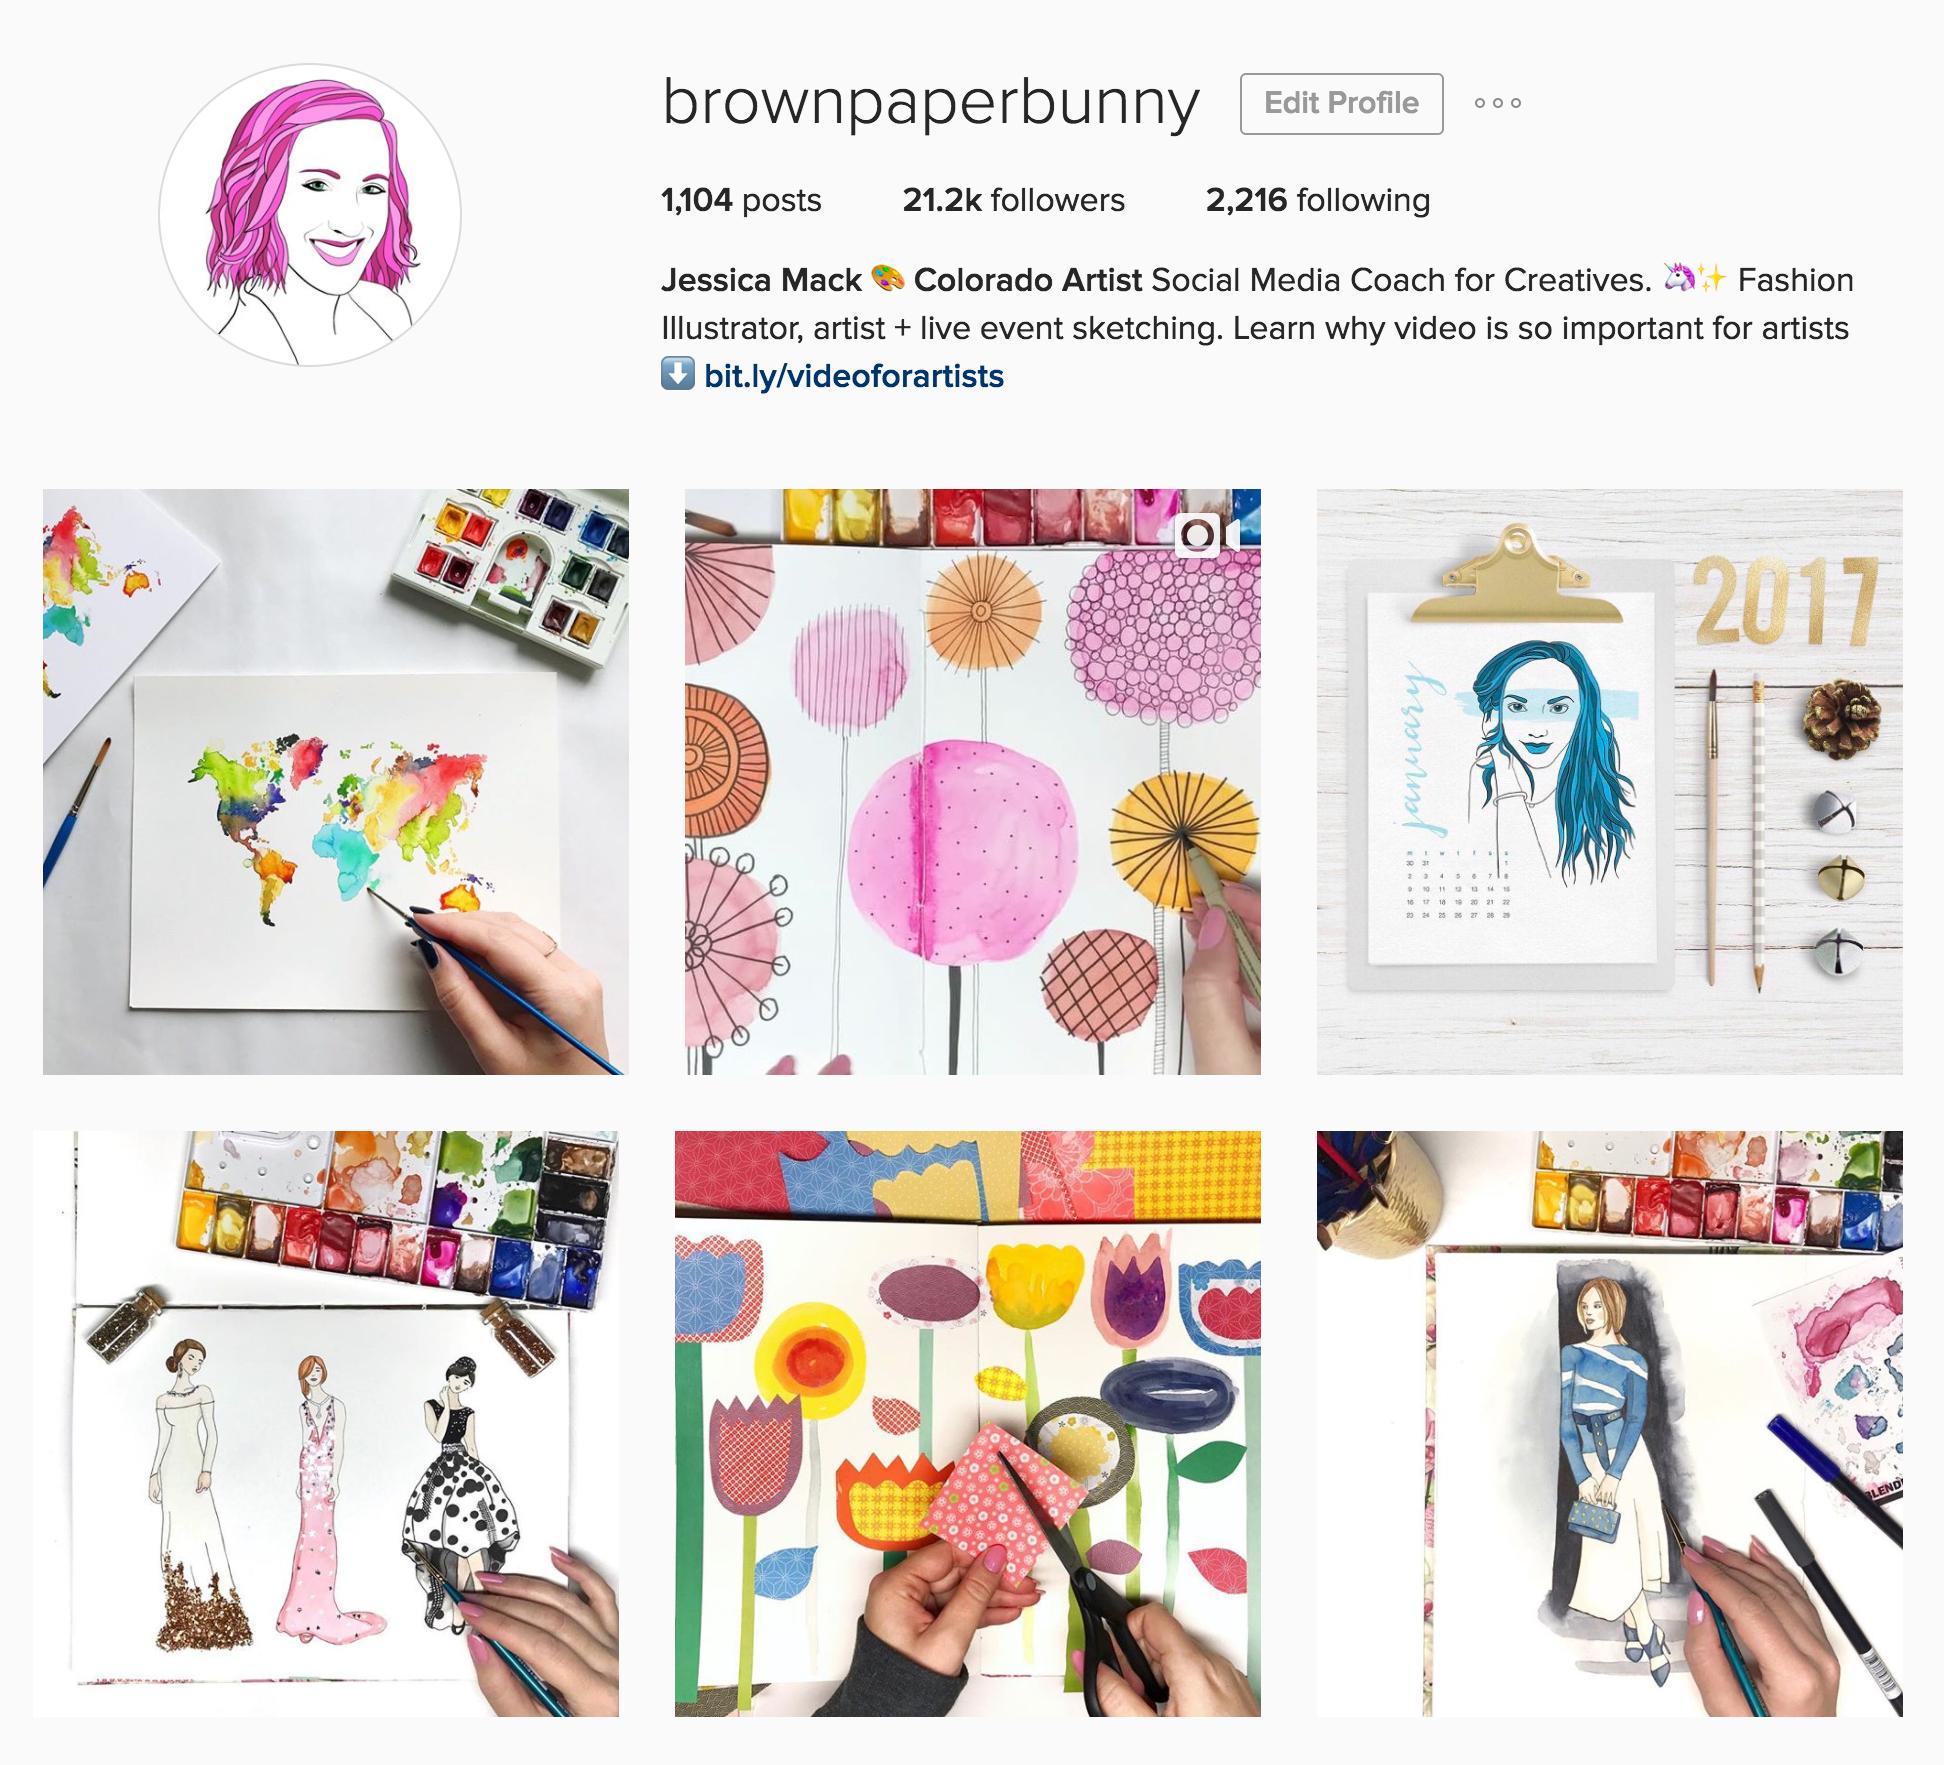 BrownPaperBunny Artist and Fashion Illustrator on Instagram